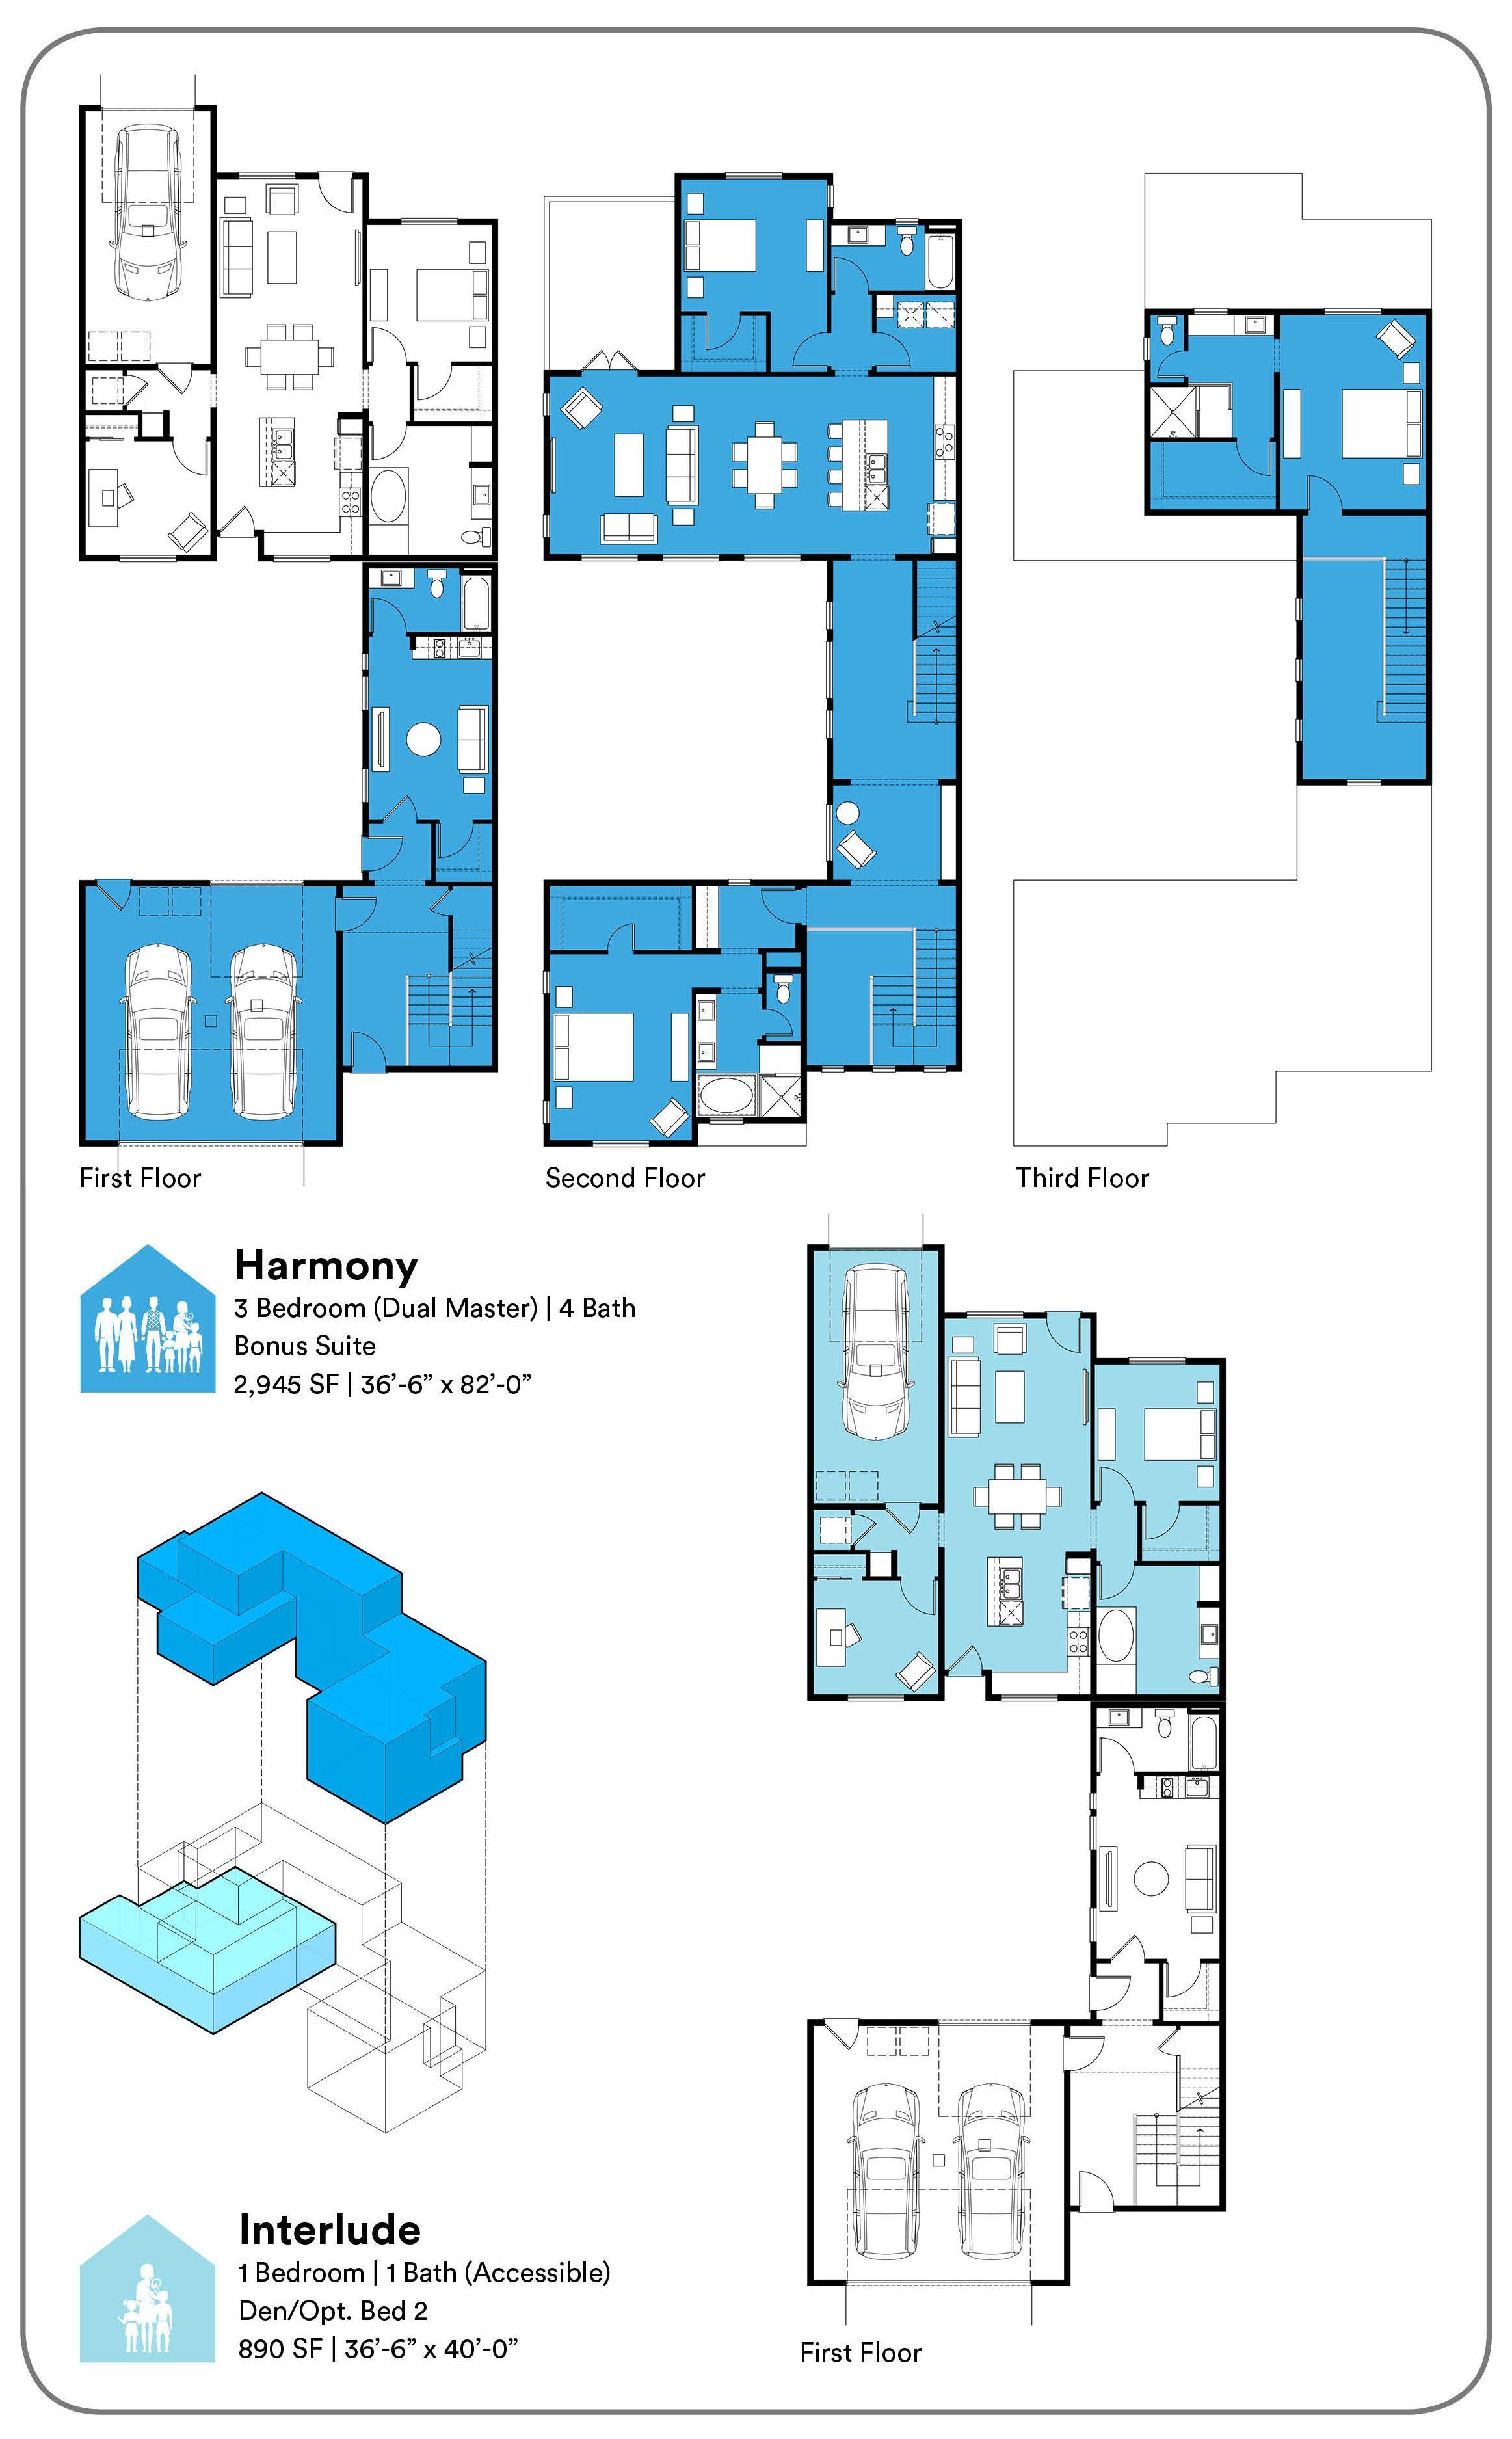 Ensemble Multi Generational Architecture Plan Architecture